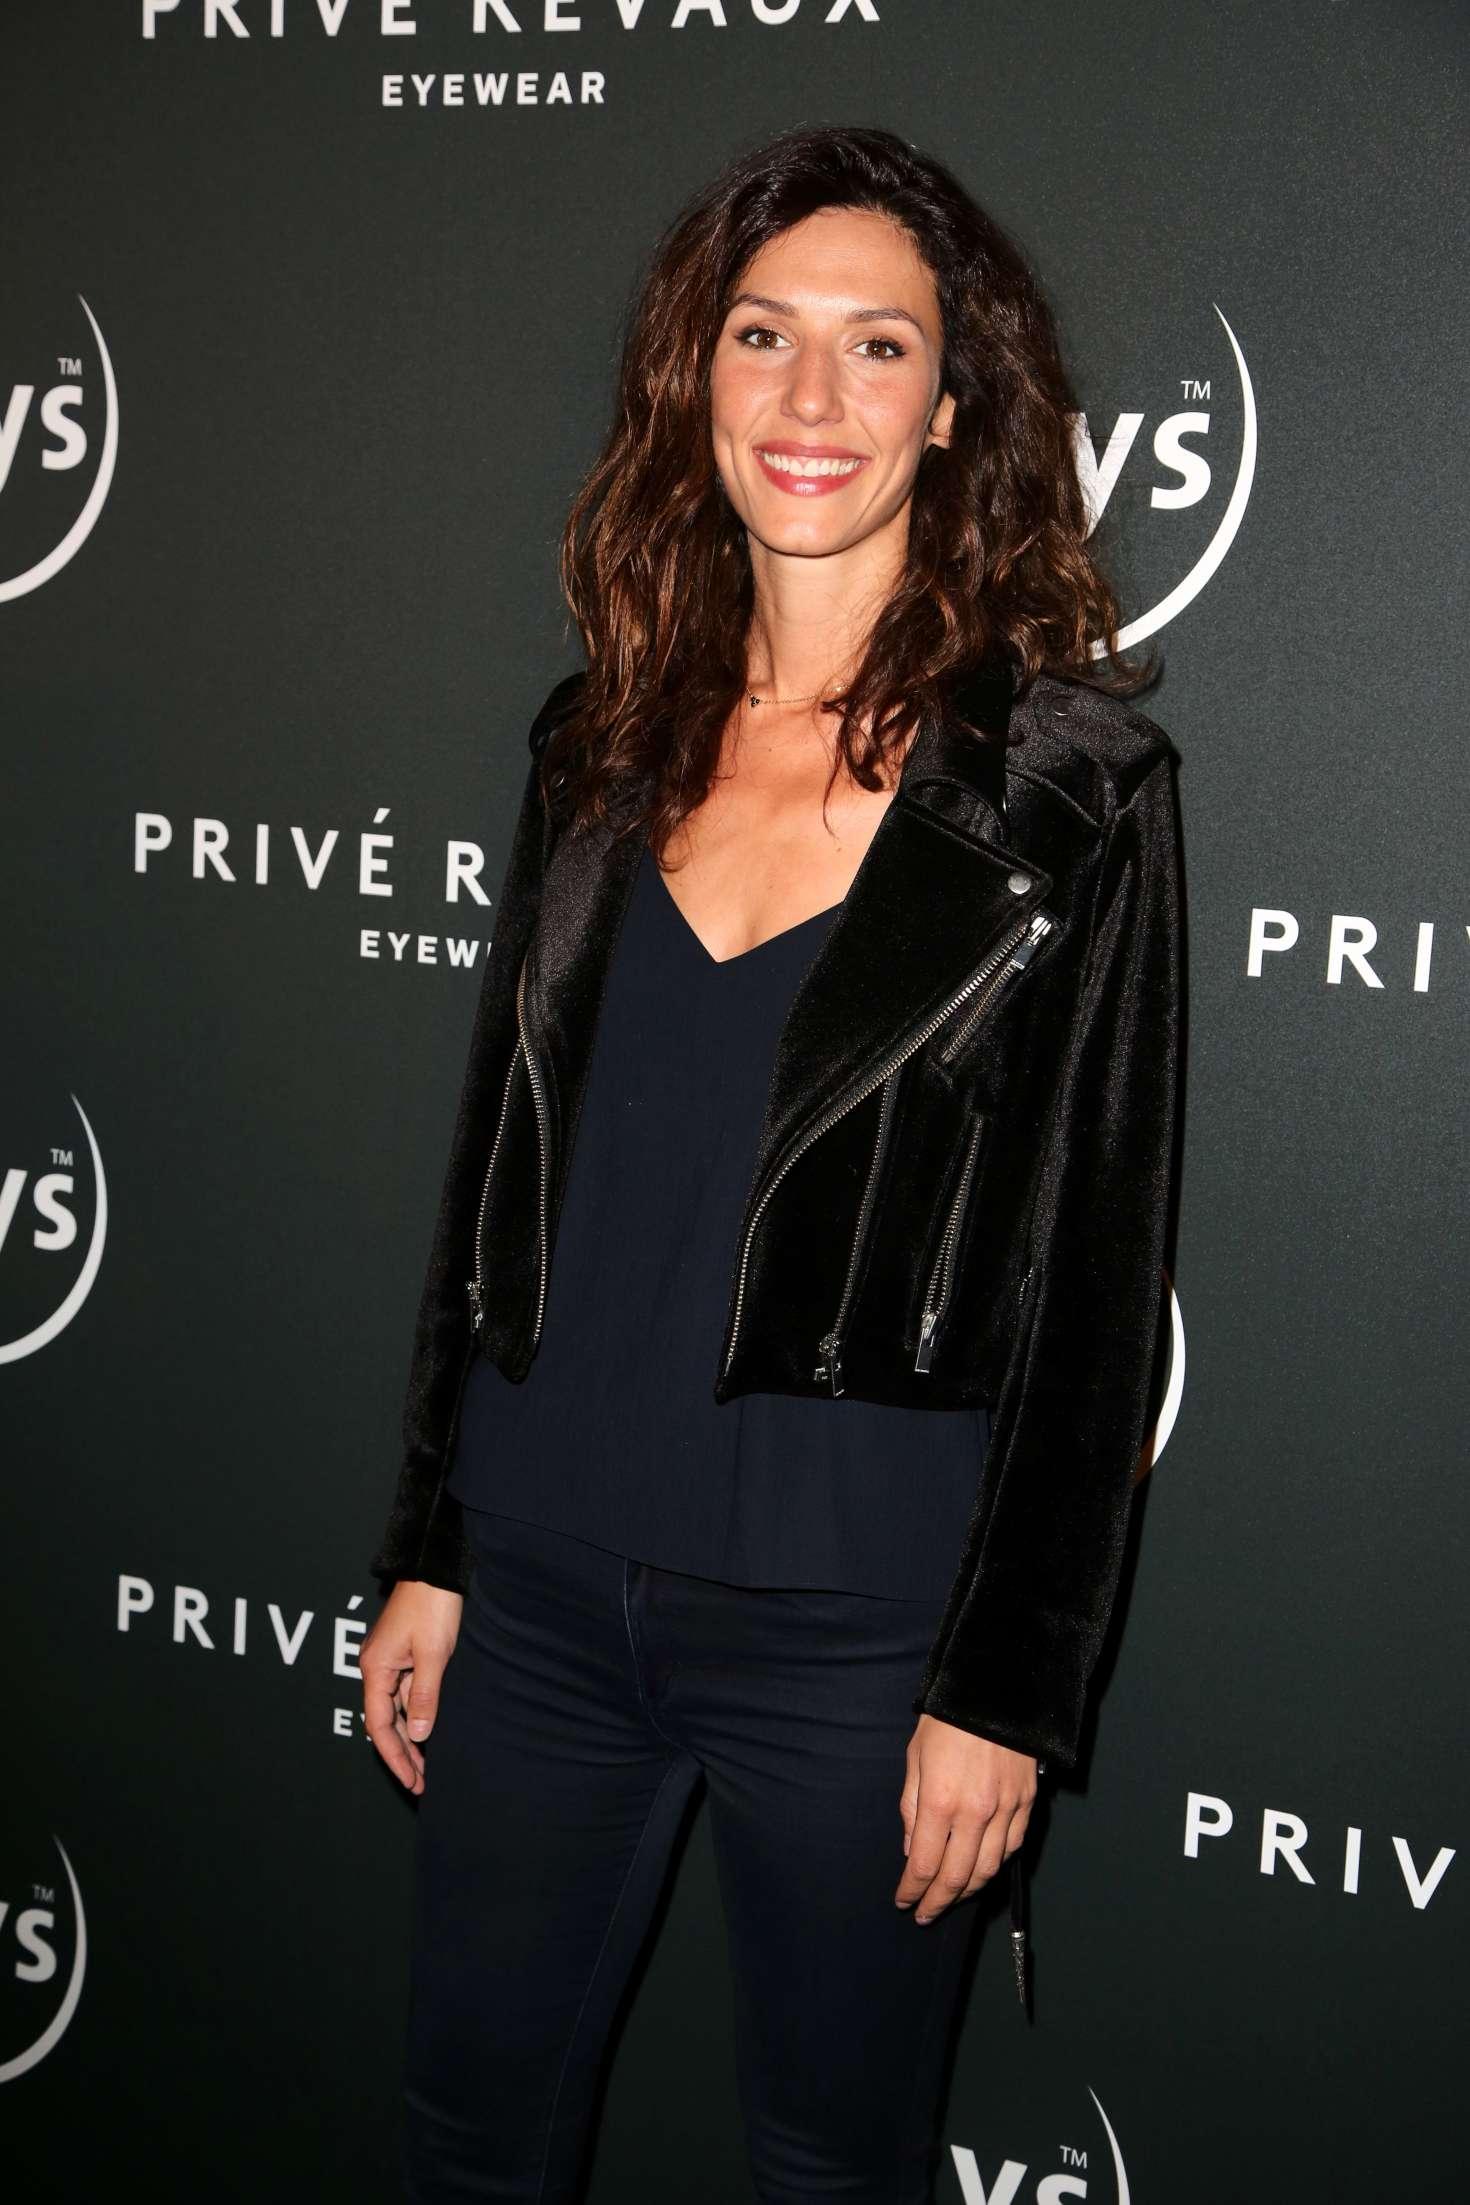 Doria Tillier - Prive Revaux Eyewear By Krys Party in Paris